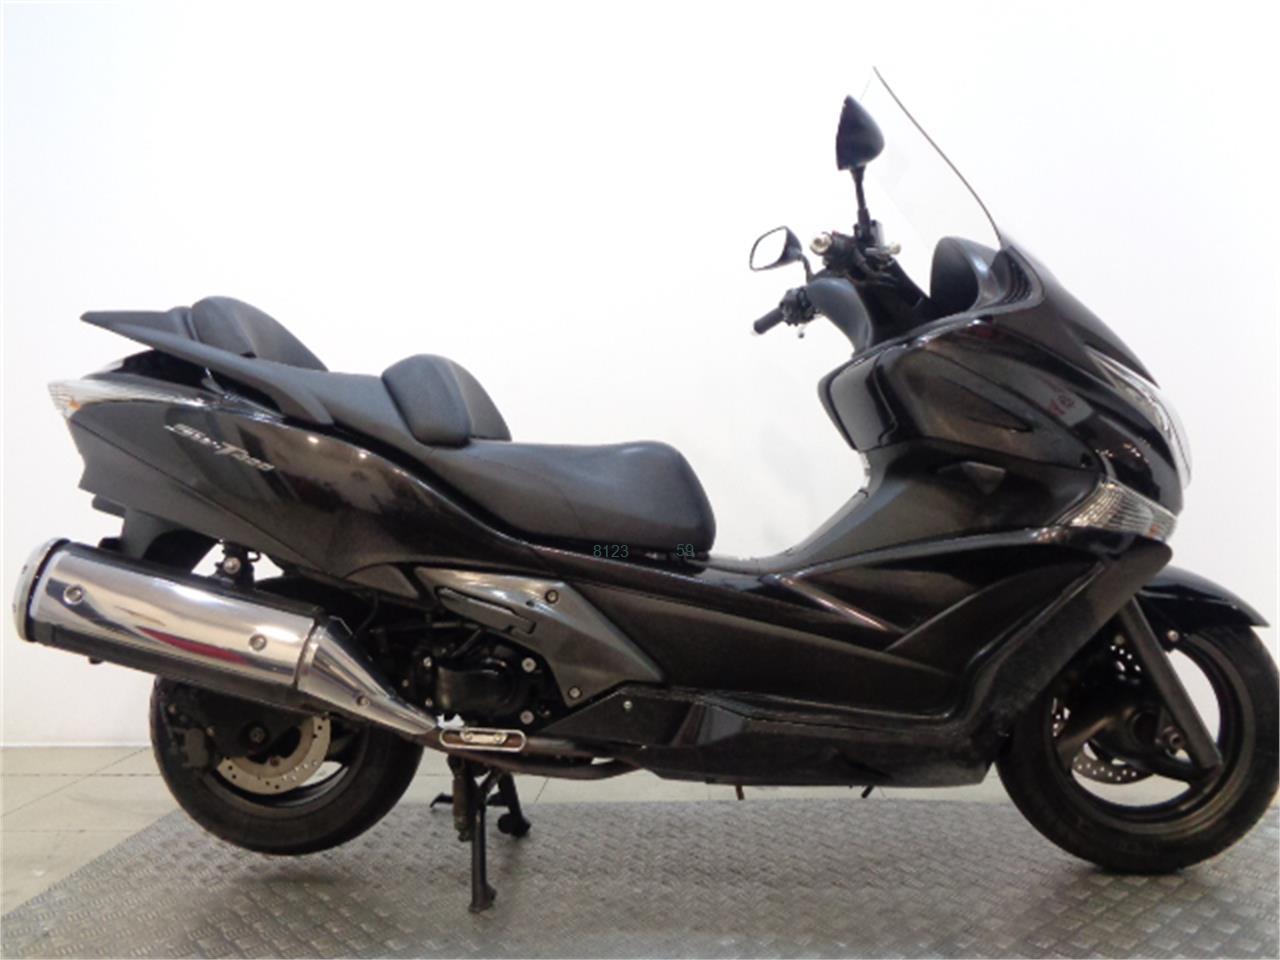 HONDA SW T400 ABS_1 de venta en Málaga